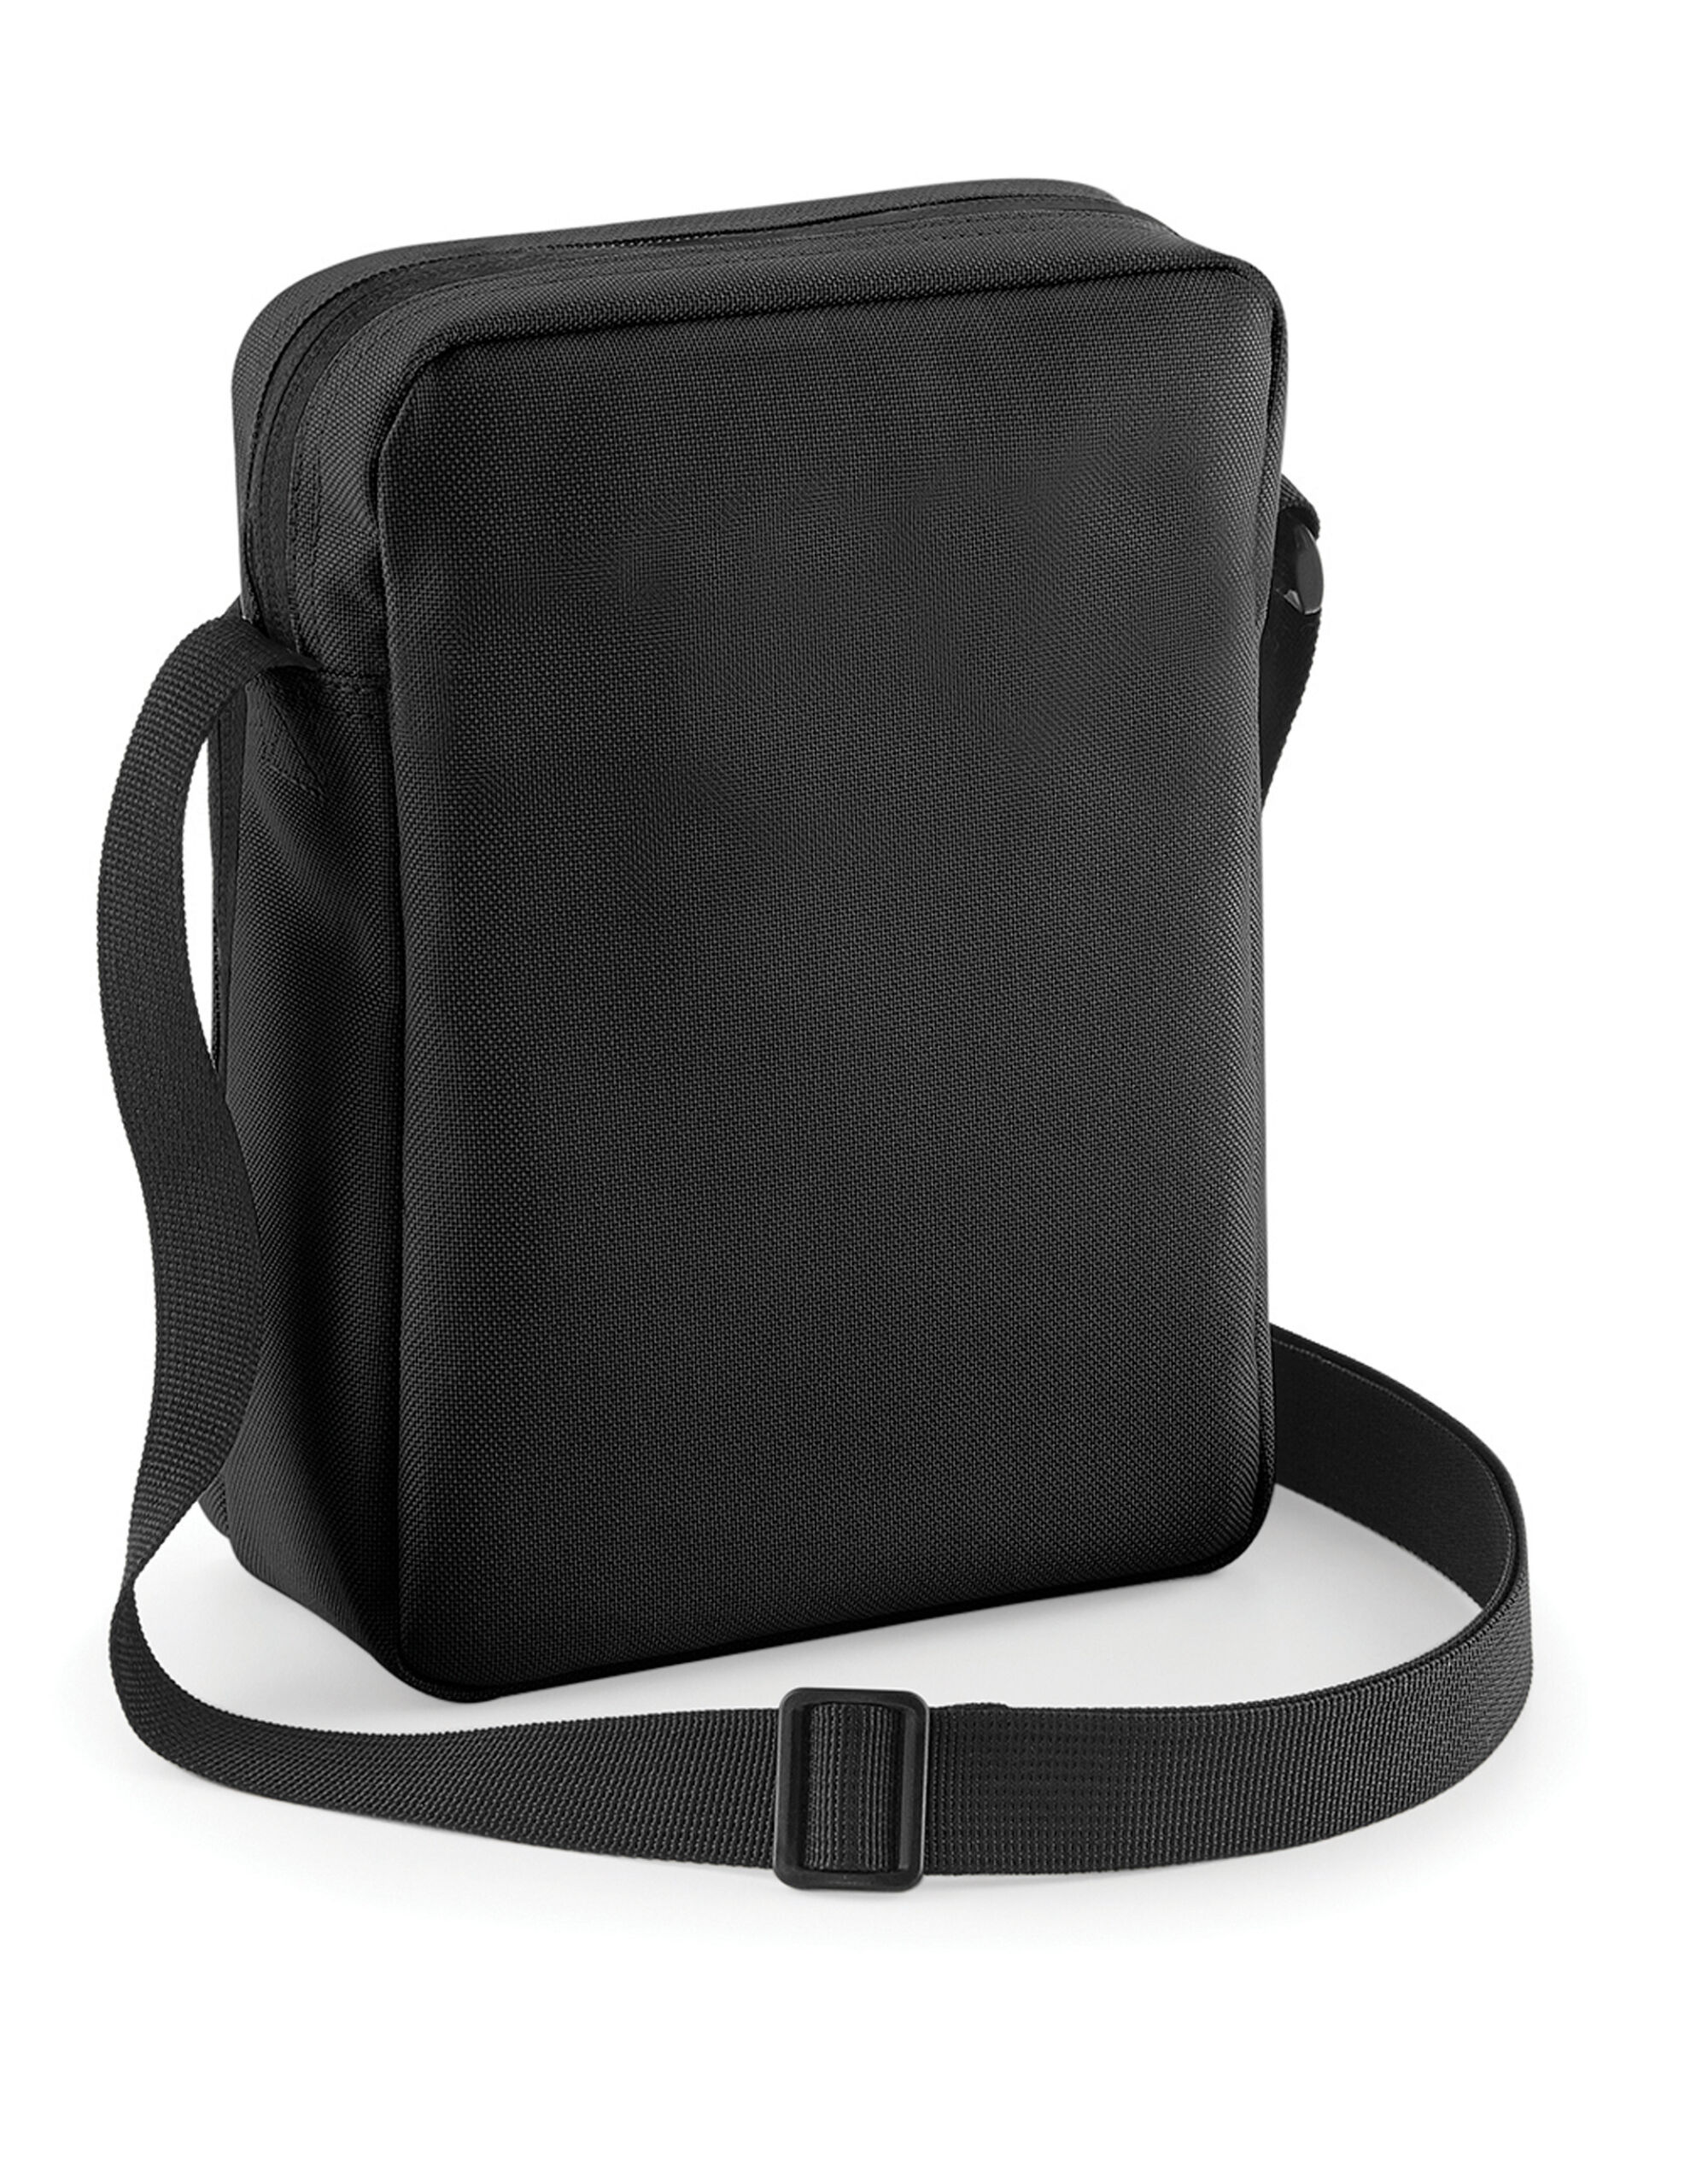 Accross Body Bag